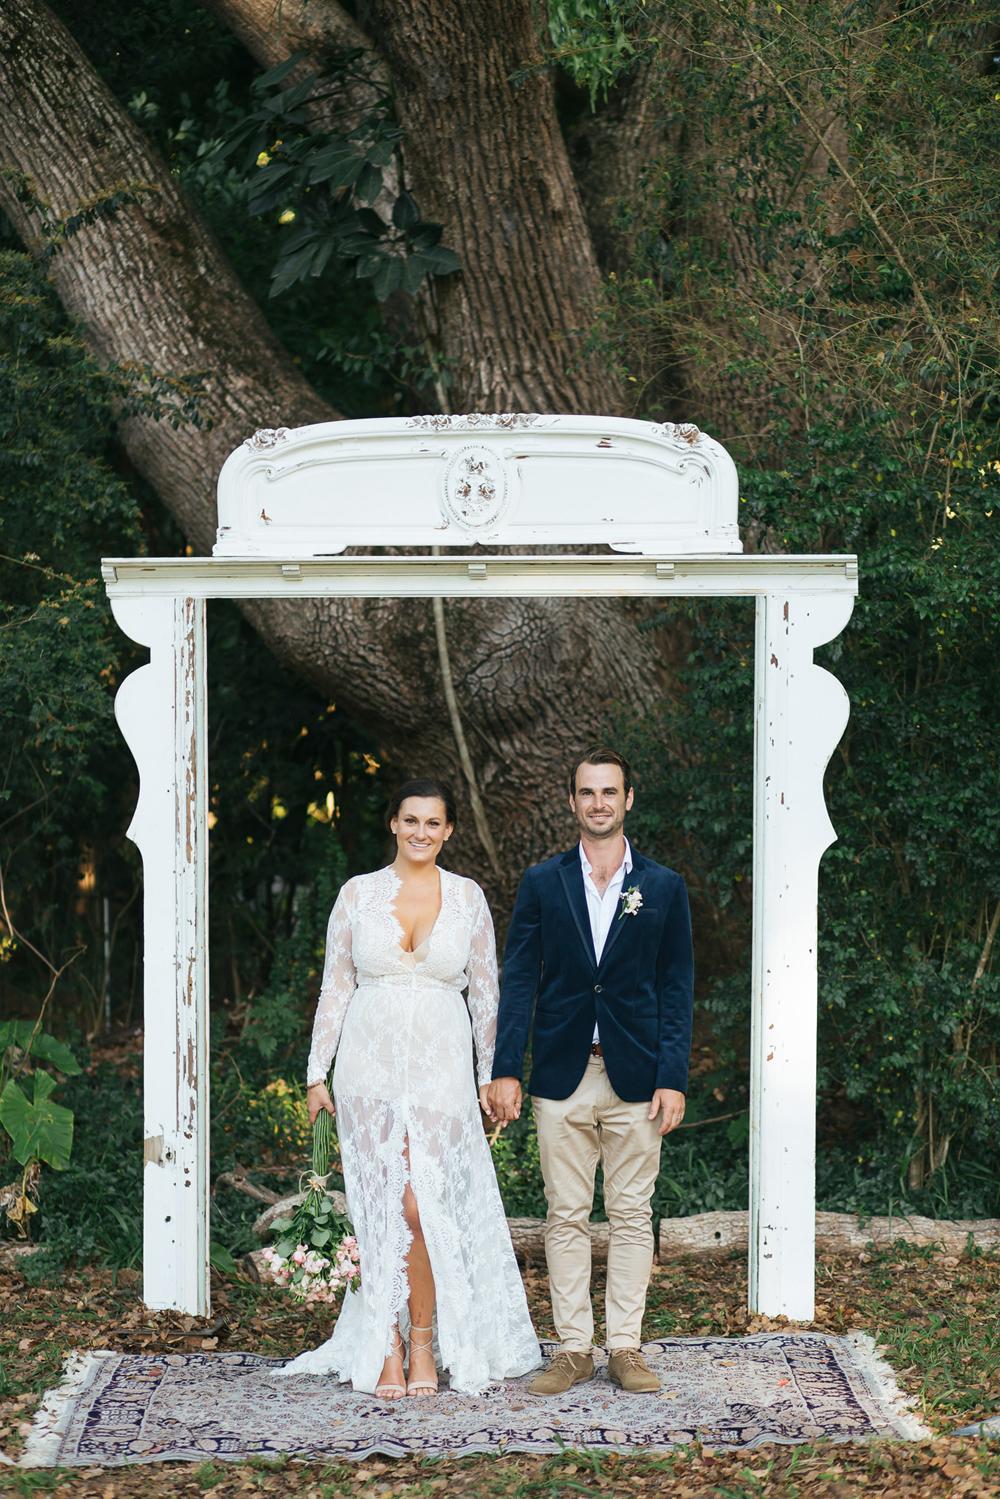 120-Byron-Bay-Wedding-Photographer-Carly-Tia-Photography.jpg